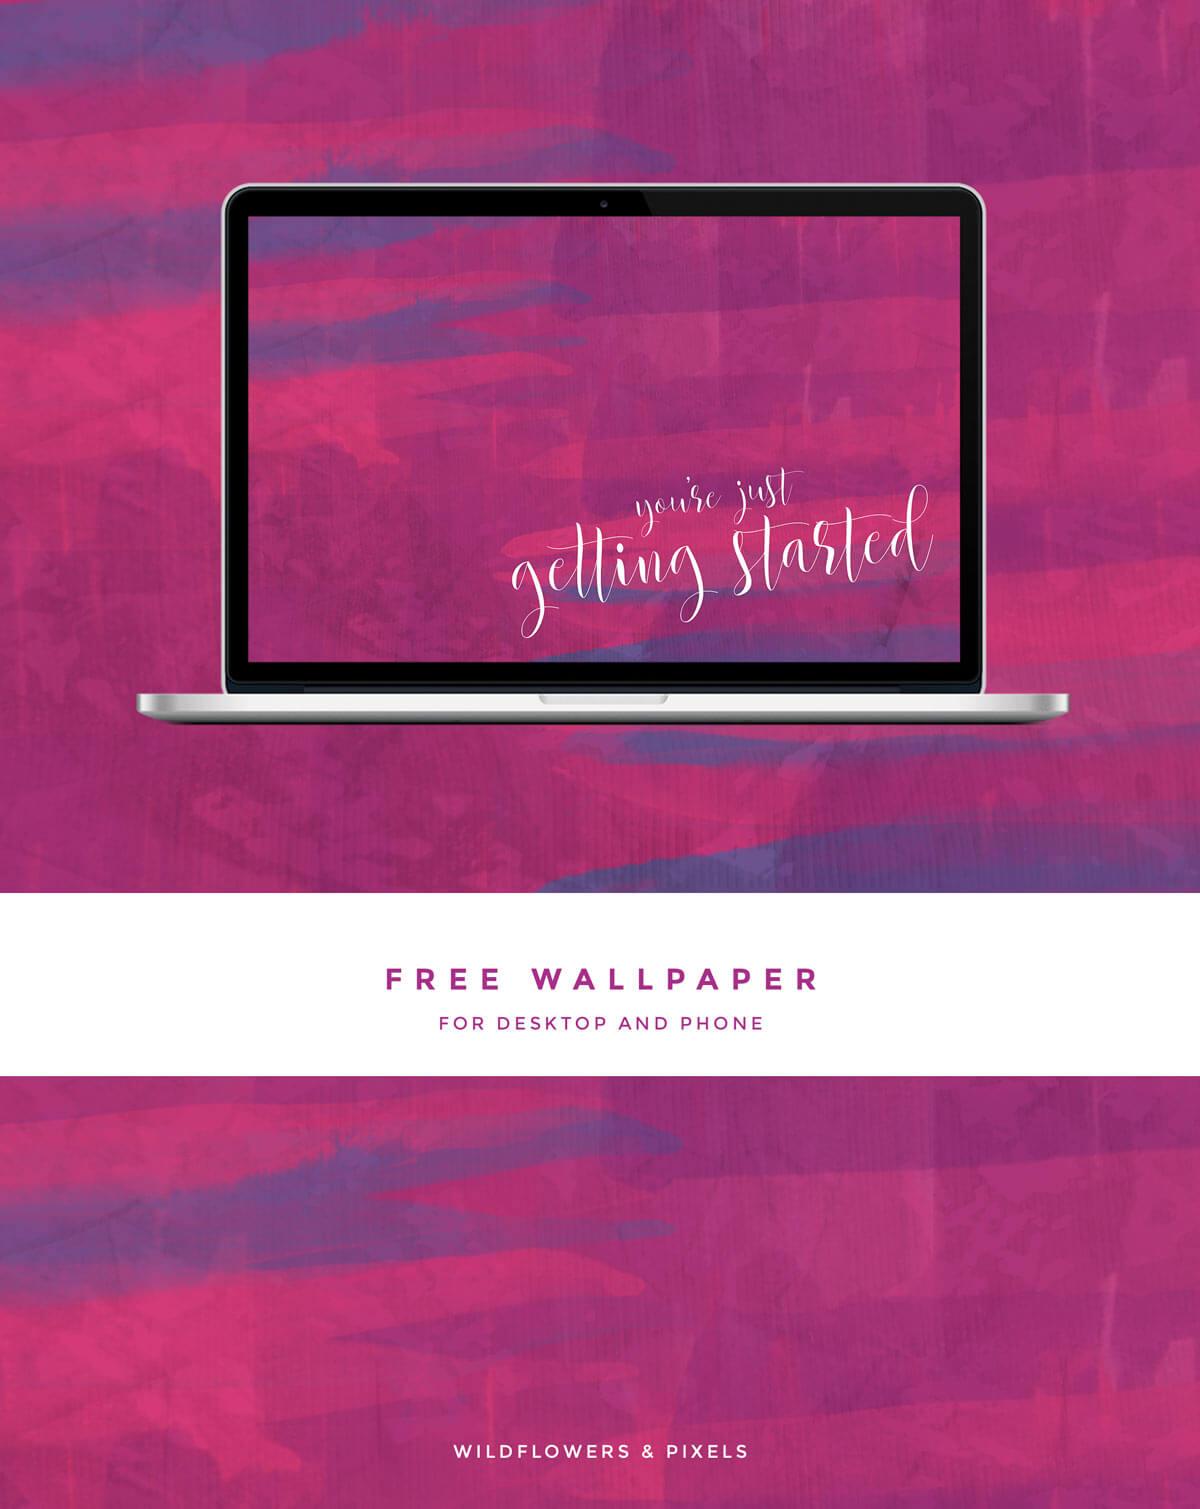 You're Just Getting Started Free Wallpaper | By Wildflowers & Pixels [ Falkirk Website Design Studio ]